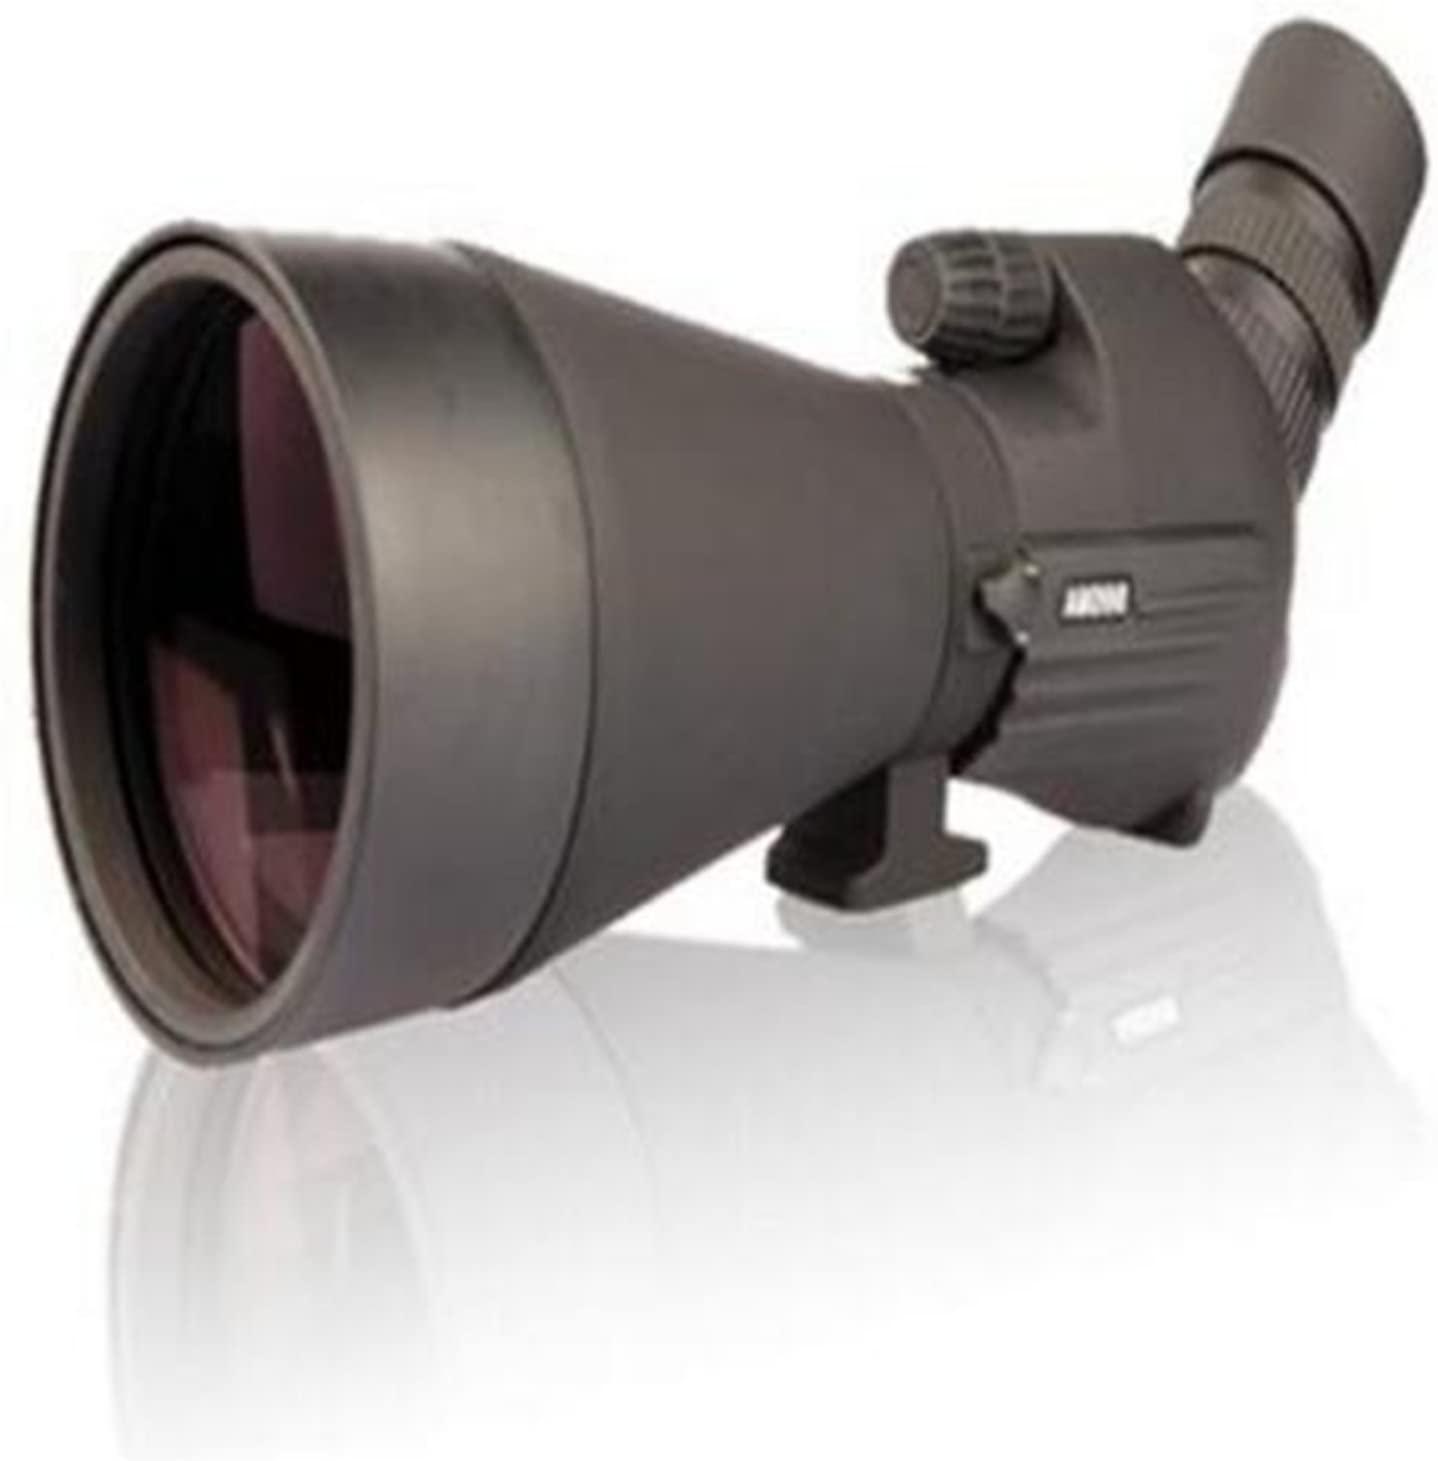 BOSMA binoculars hummingbird 20-60x 85A multi-coated waterproof binoculars high-powered spotting scopes exposed Dutch film